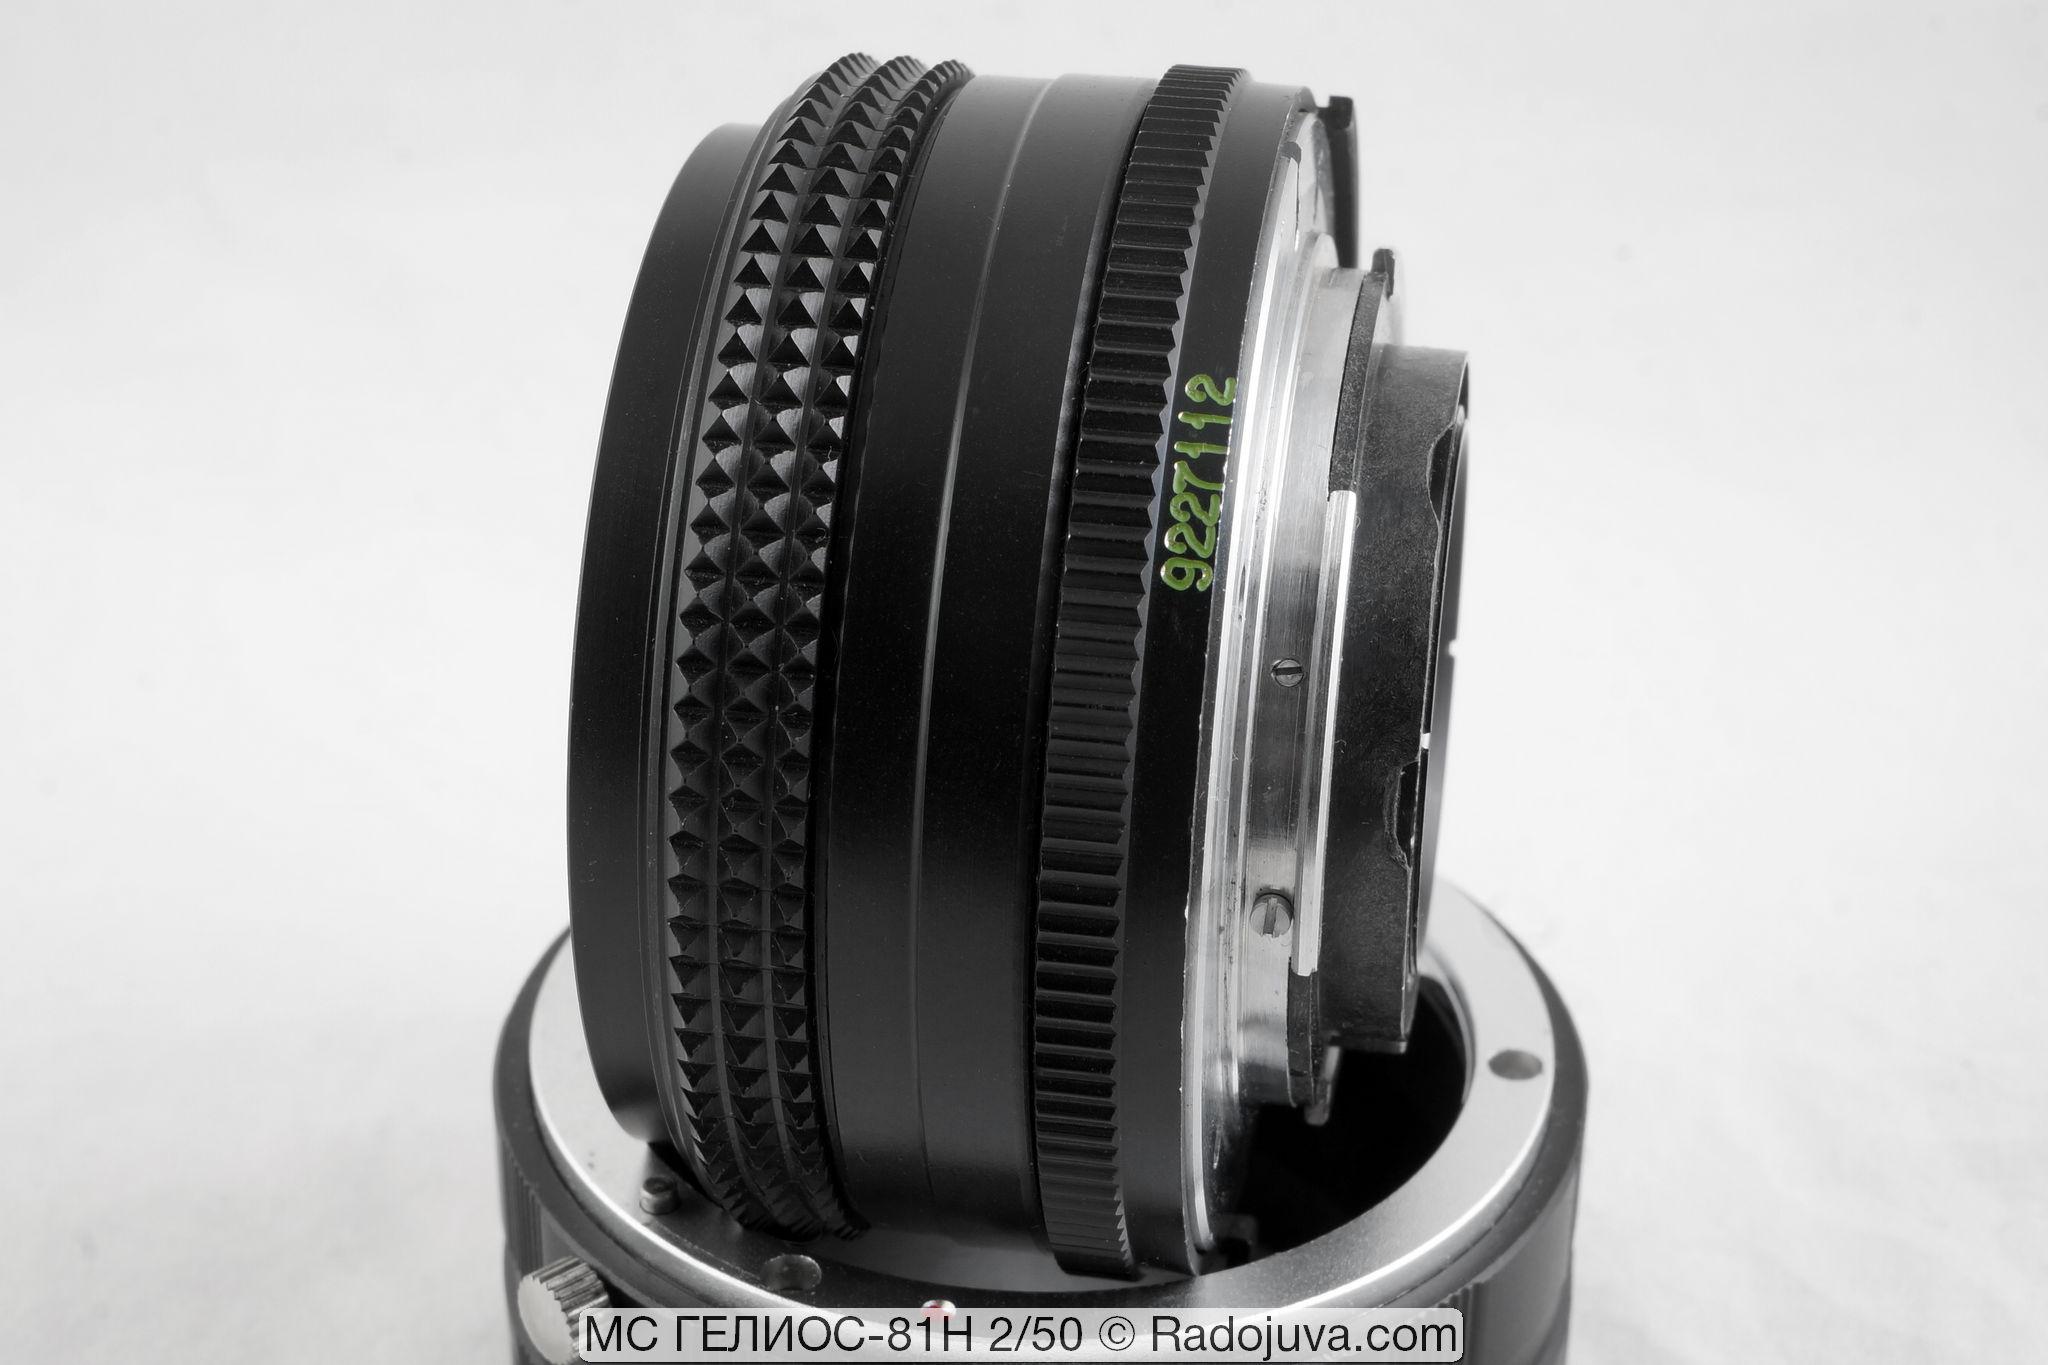 Объектив МС Гелиос-81 Н F 2 50 мм